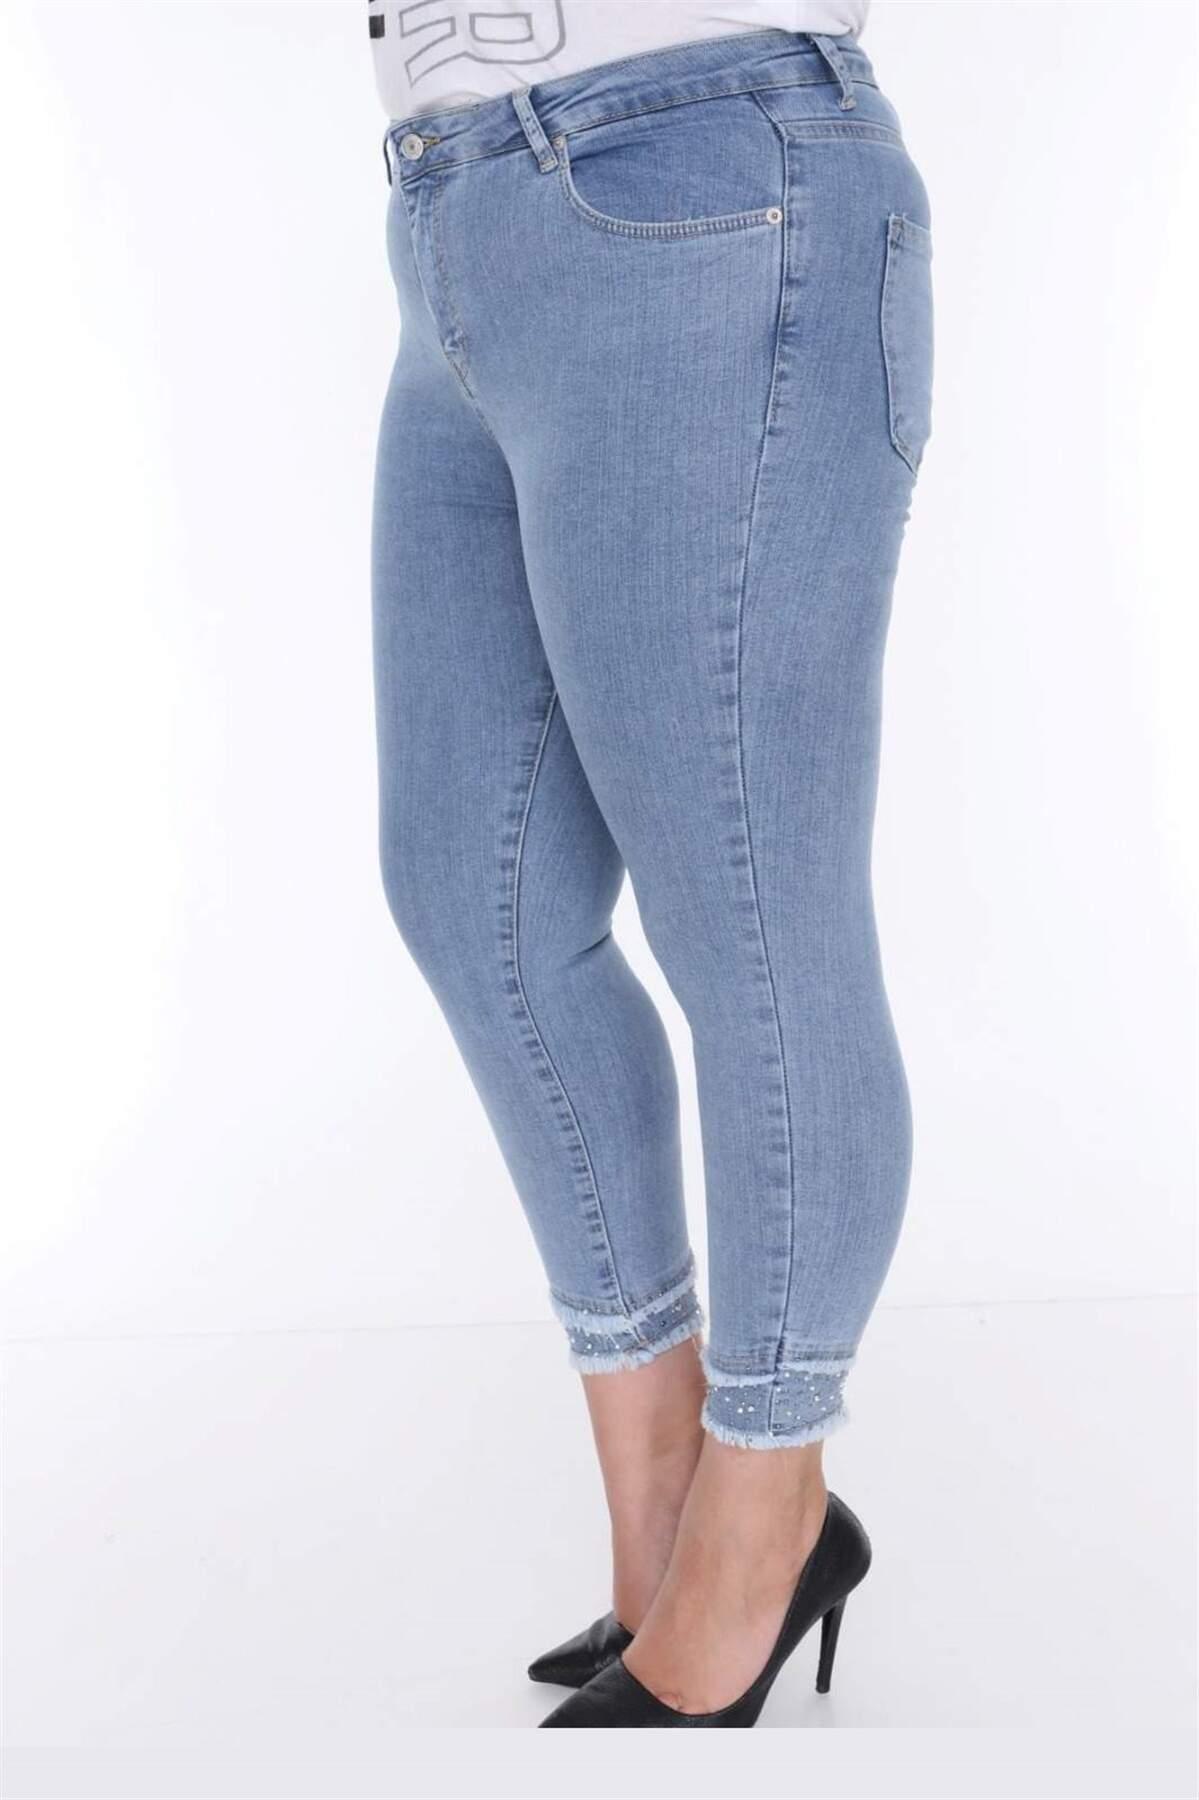 Büyük Beden Kot Pantolon Yırtık Paça Detay MF23021 Mavi